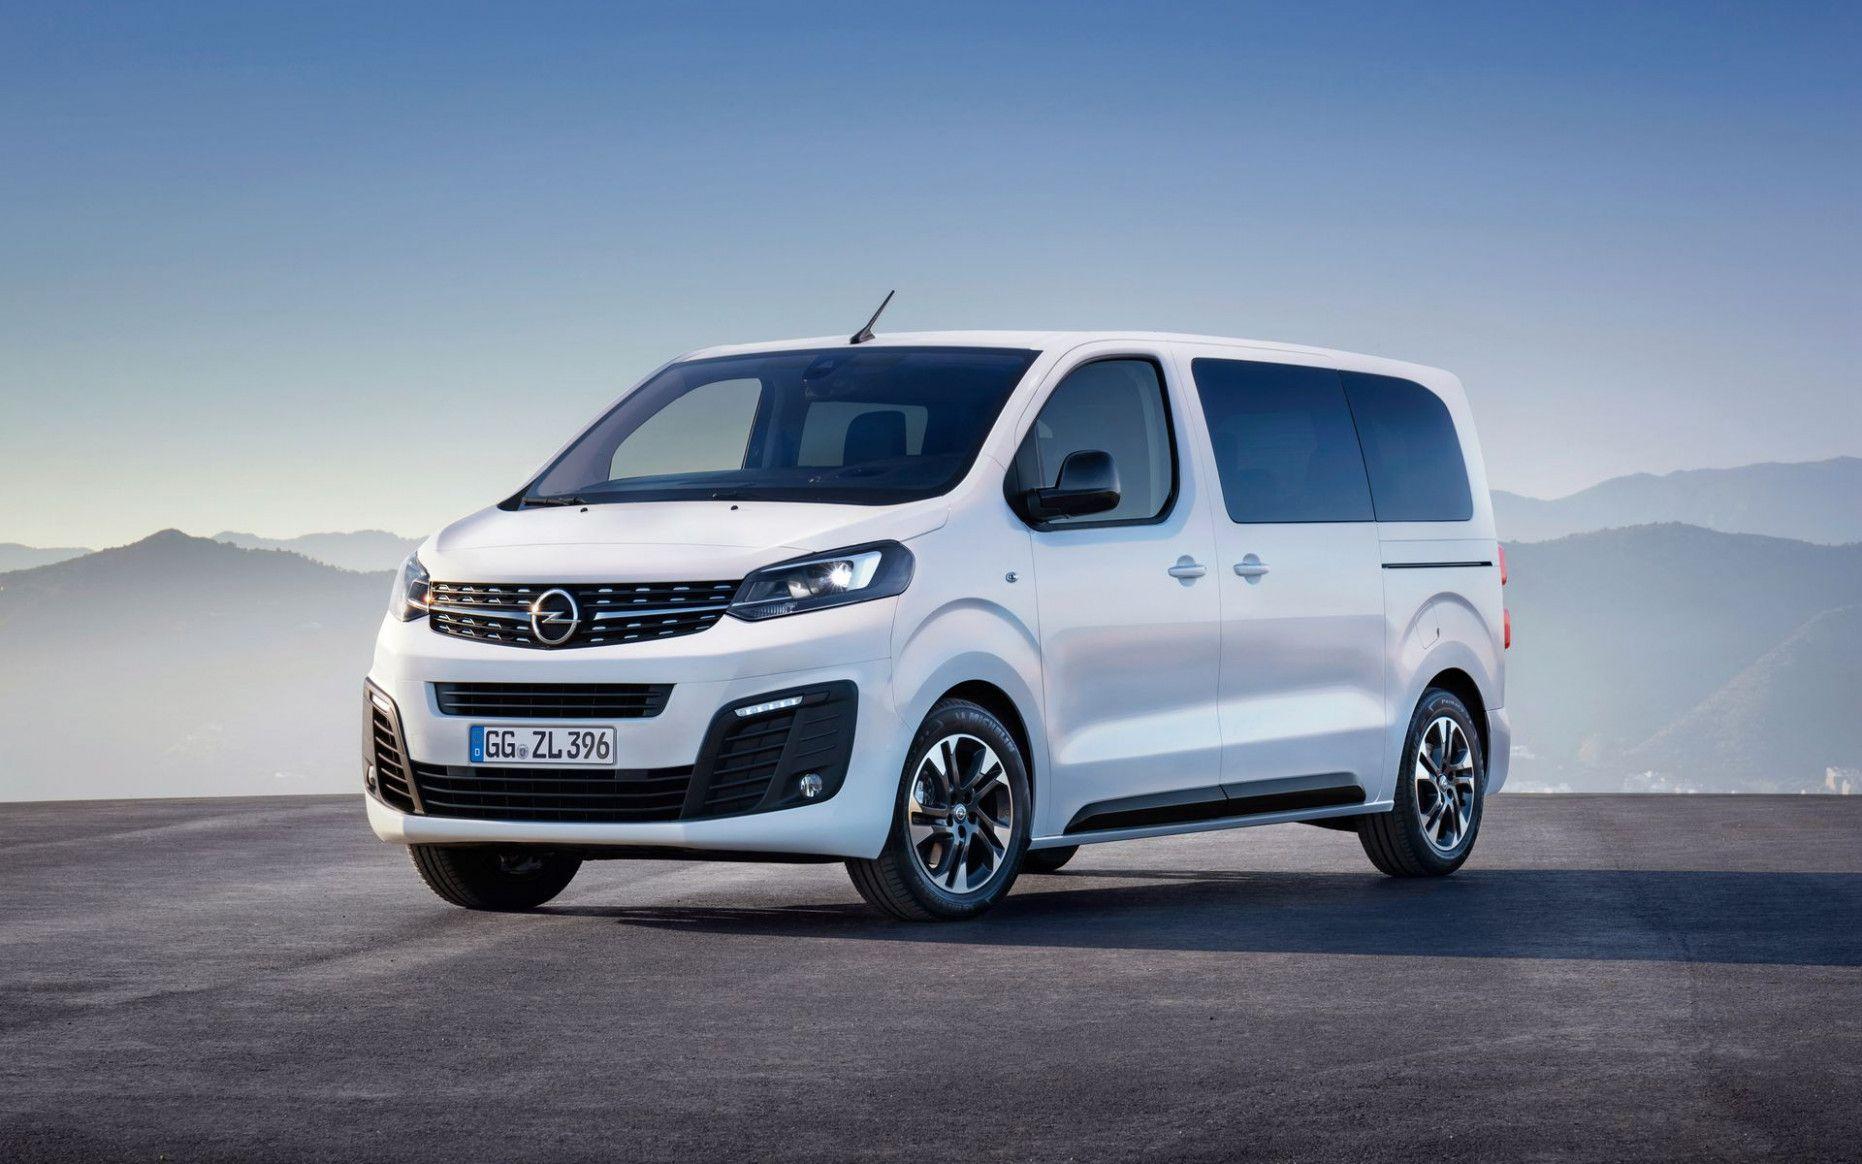 4 Opel Zafira Life Vauxhall Vivaro Life Revealed Ev Fahrzeuge Dachtrager Nissan